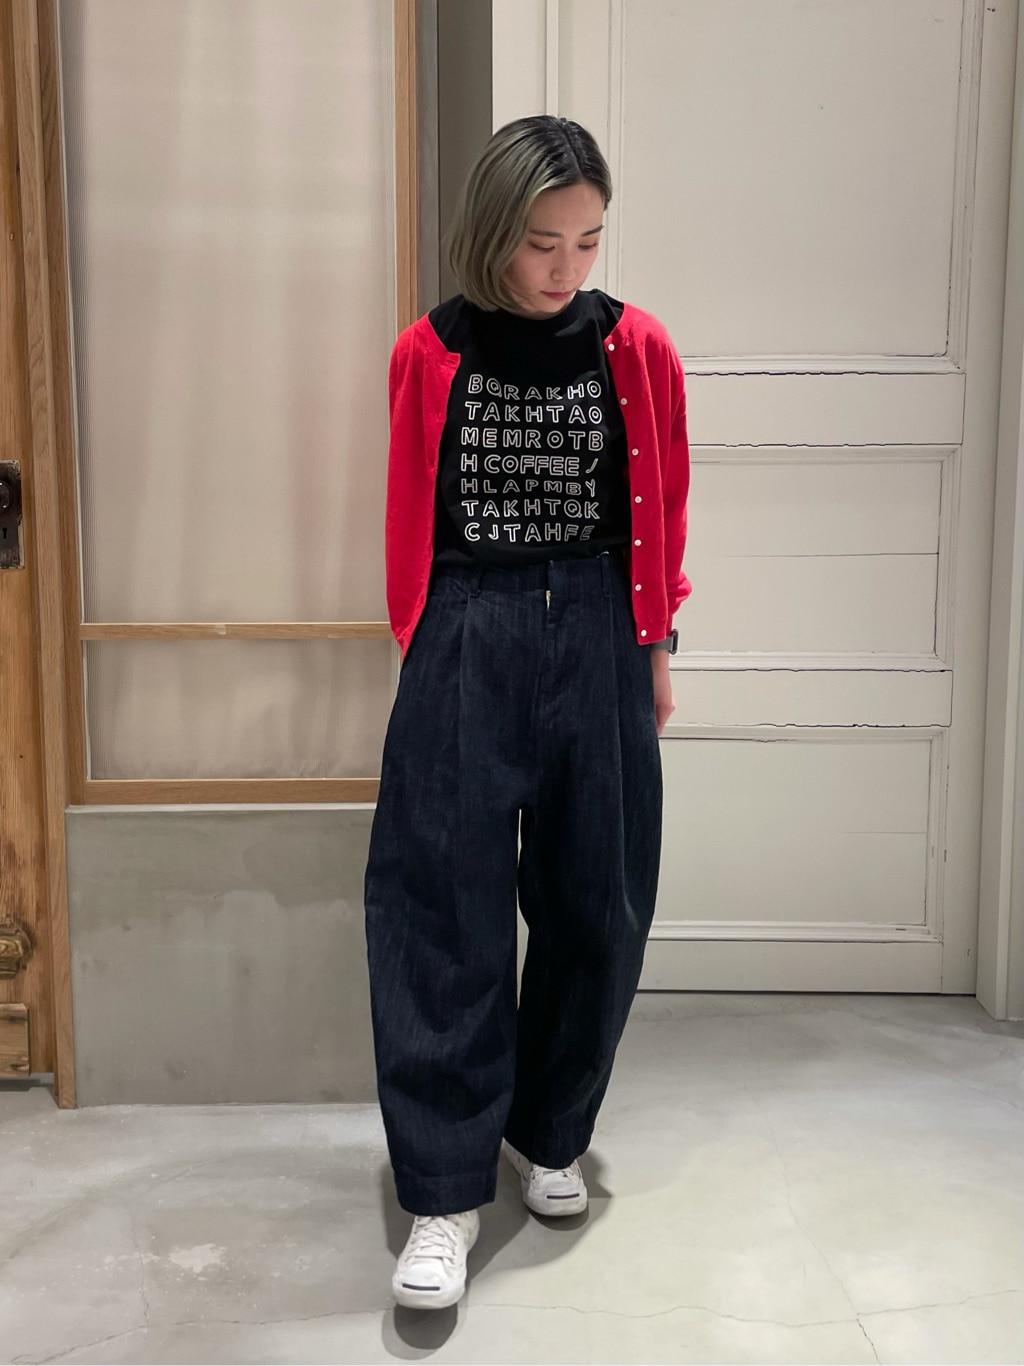 bulle de savon 渋谷スクランブルスクエア 身長:154cm 2021.04.14